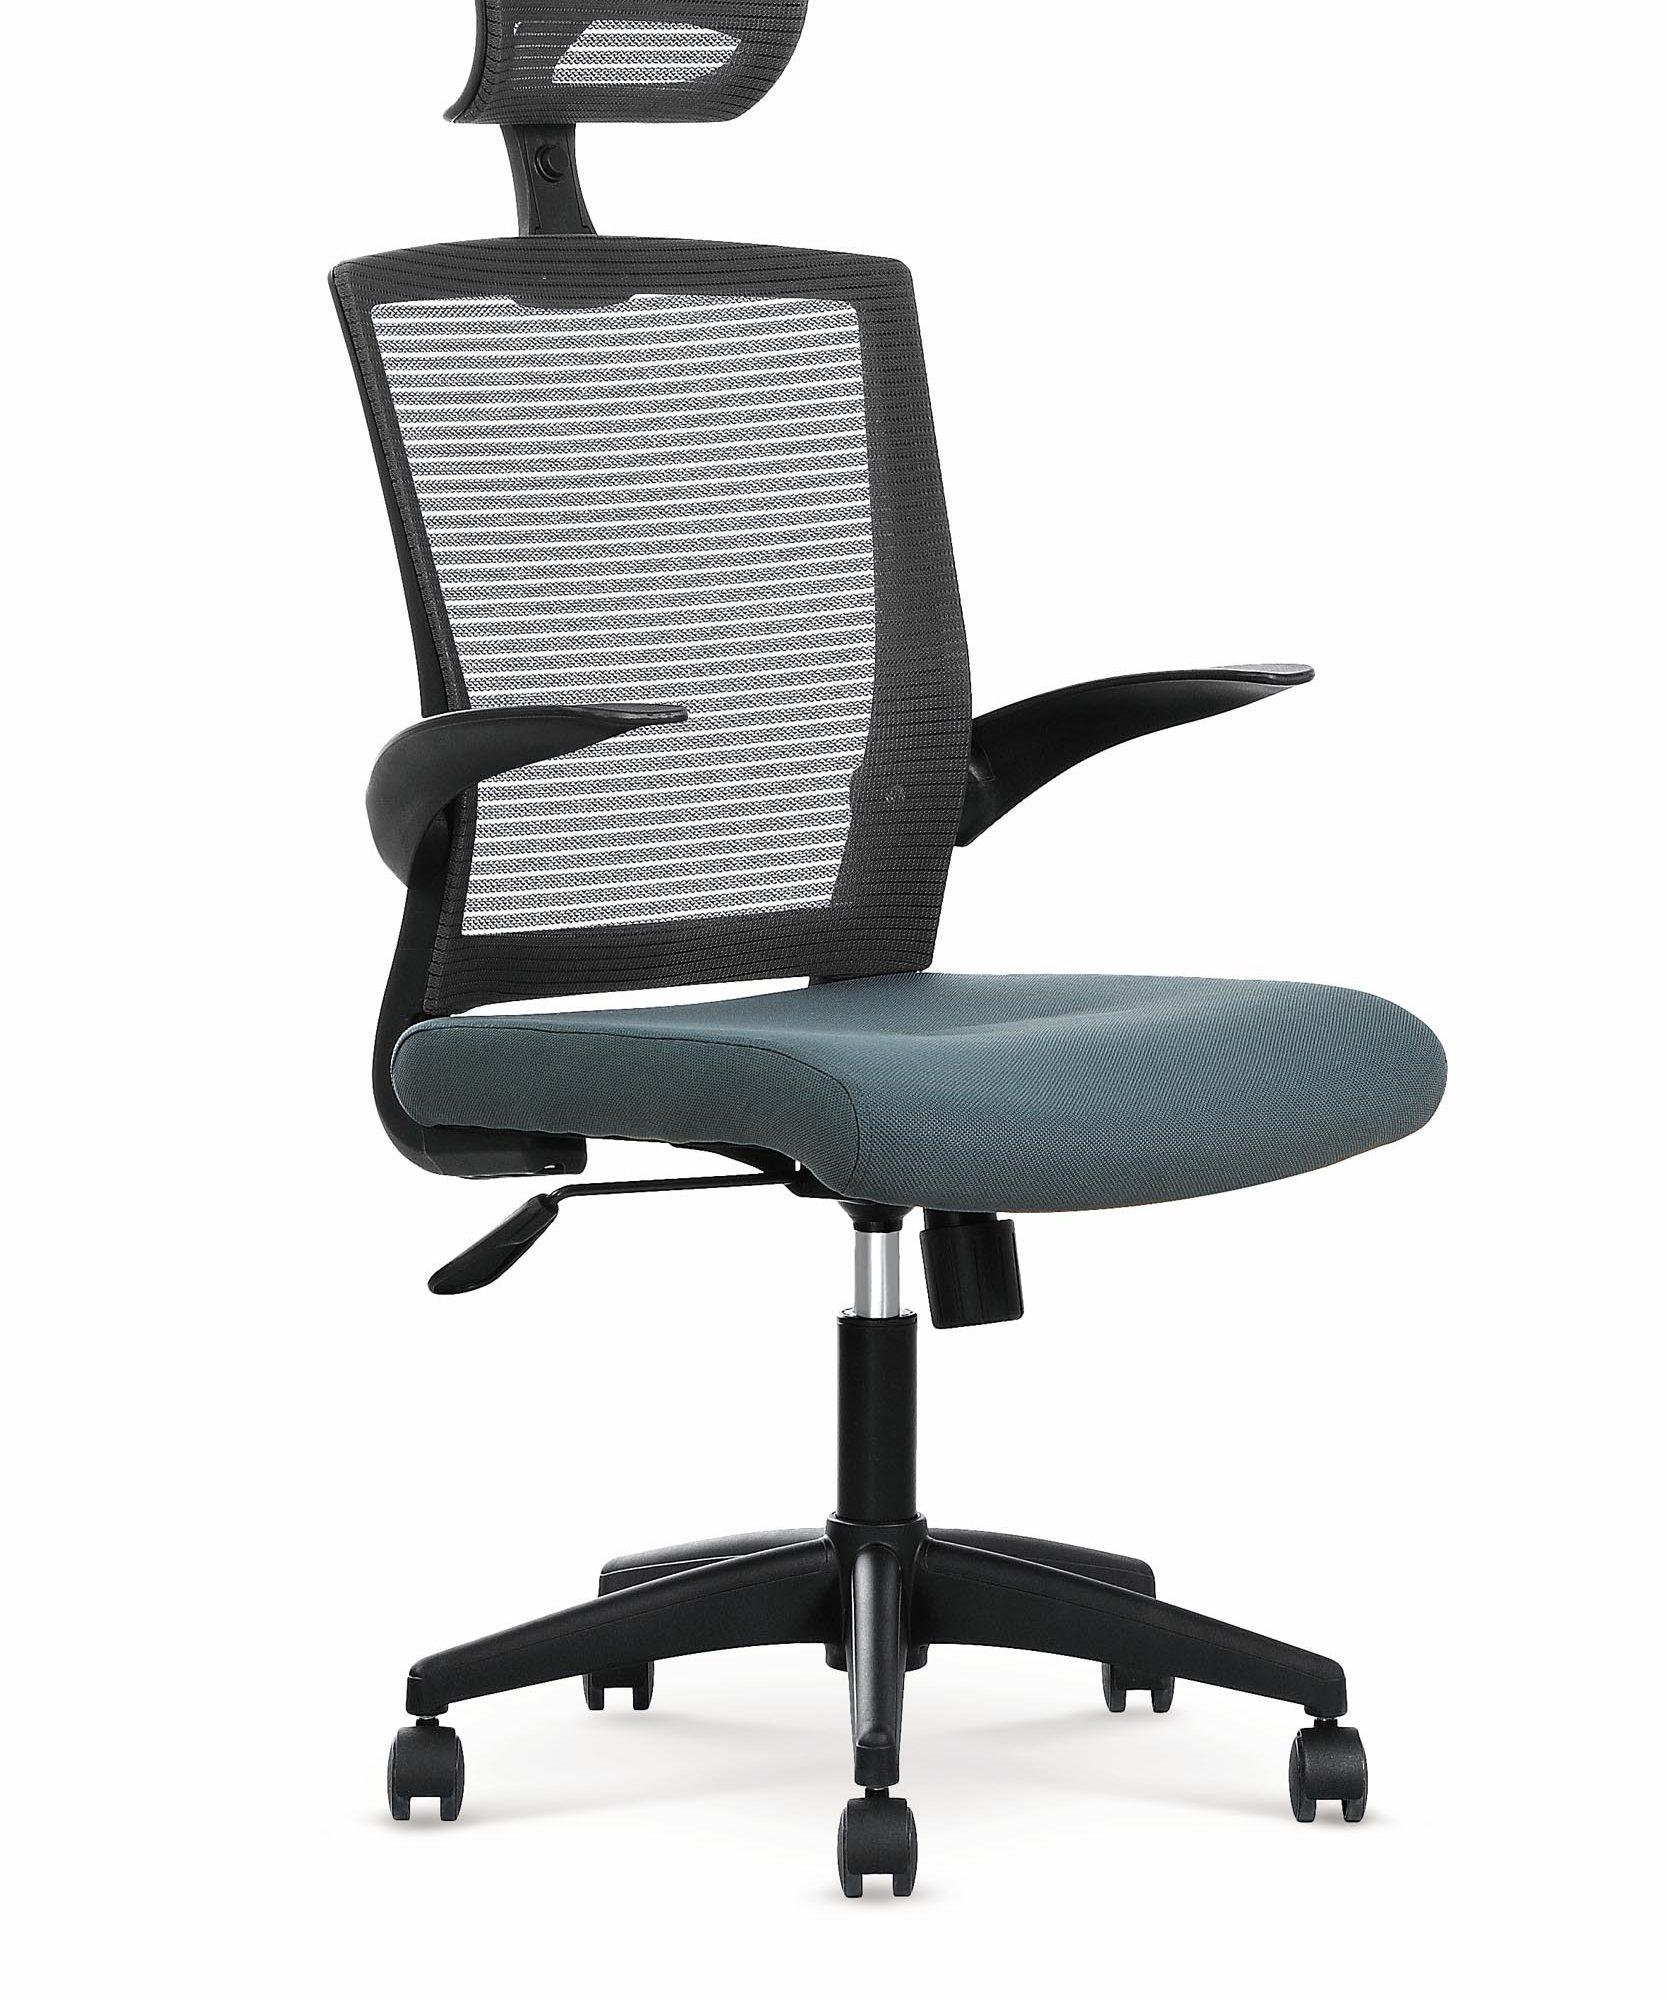 Scaun de birou ergonomic Valor Grey imagine